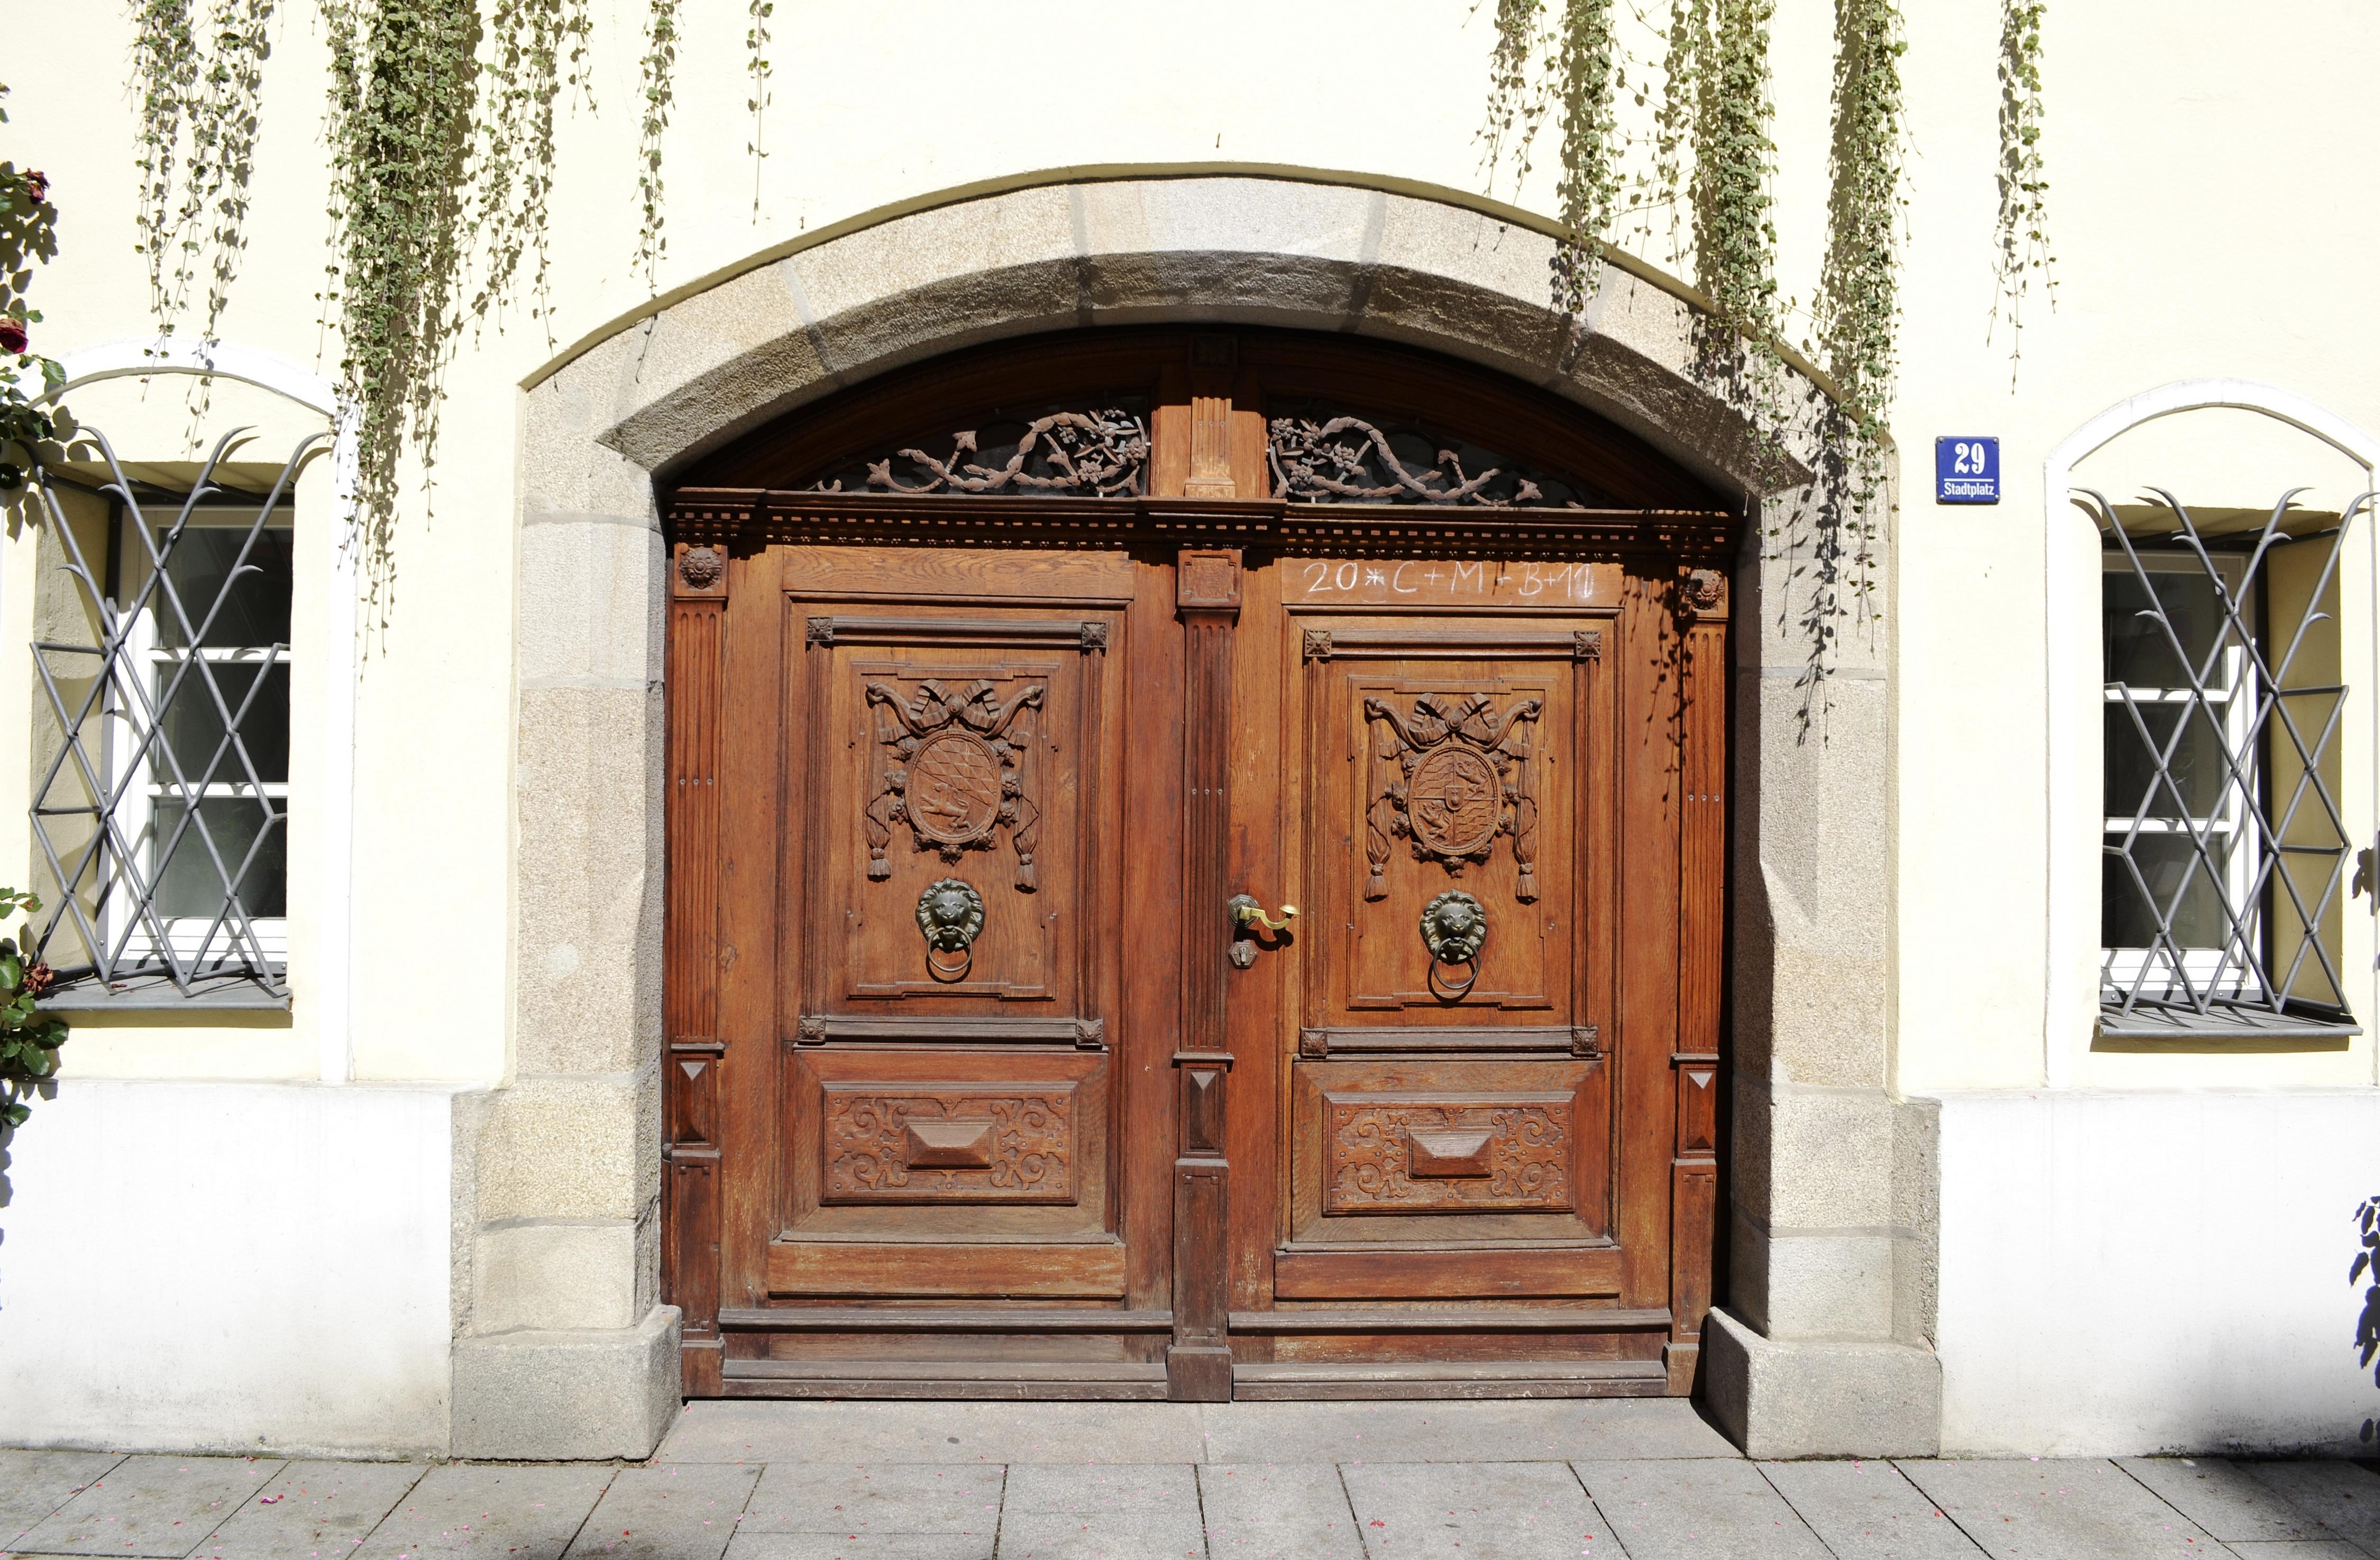 Eingangstür file rathaus vilshofen a d donau eingangstür jpg wikimedia commons